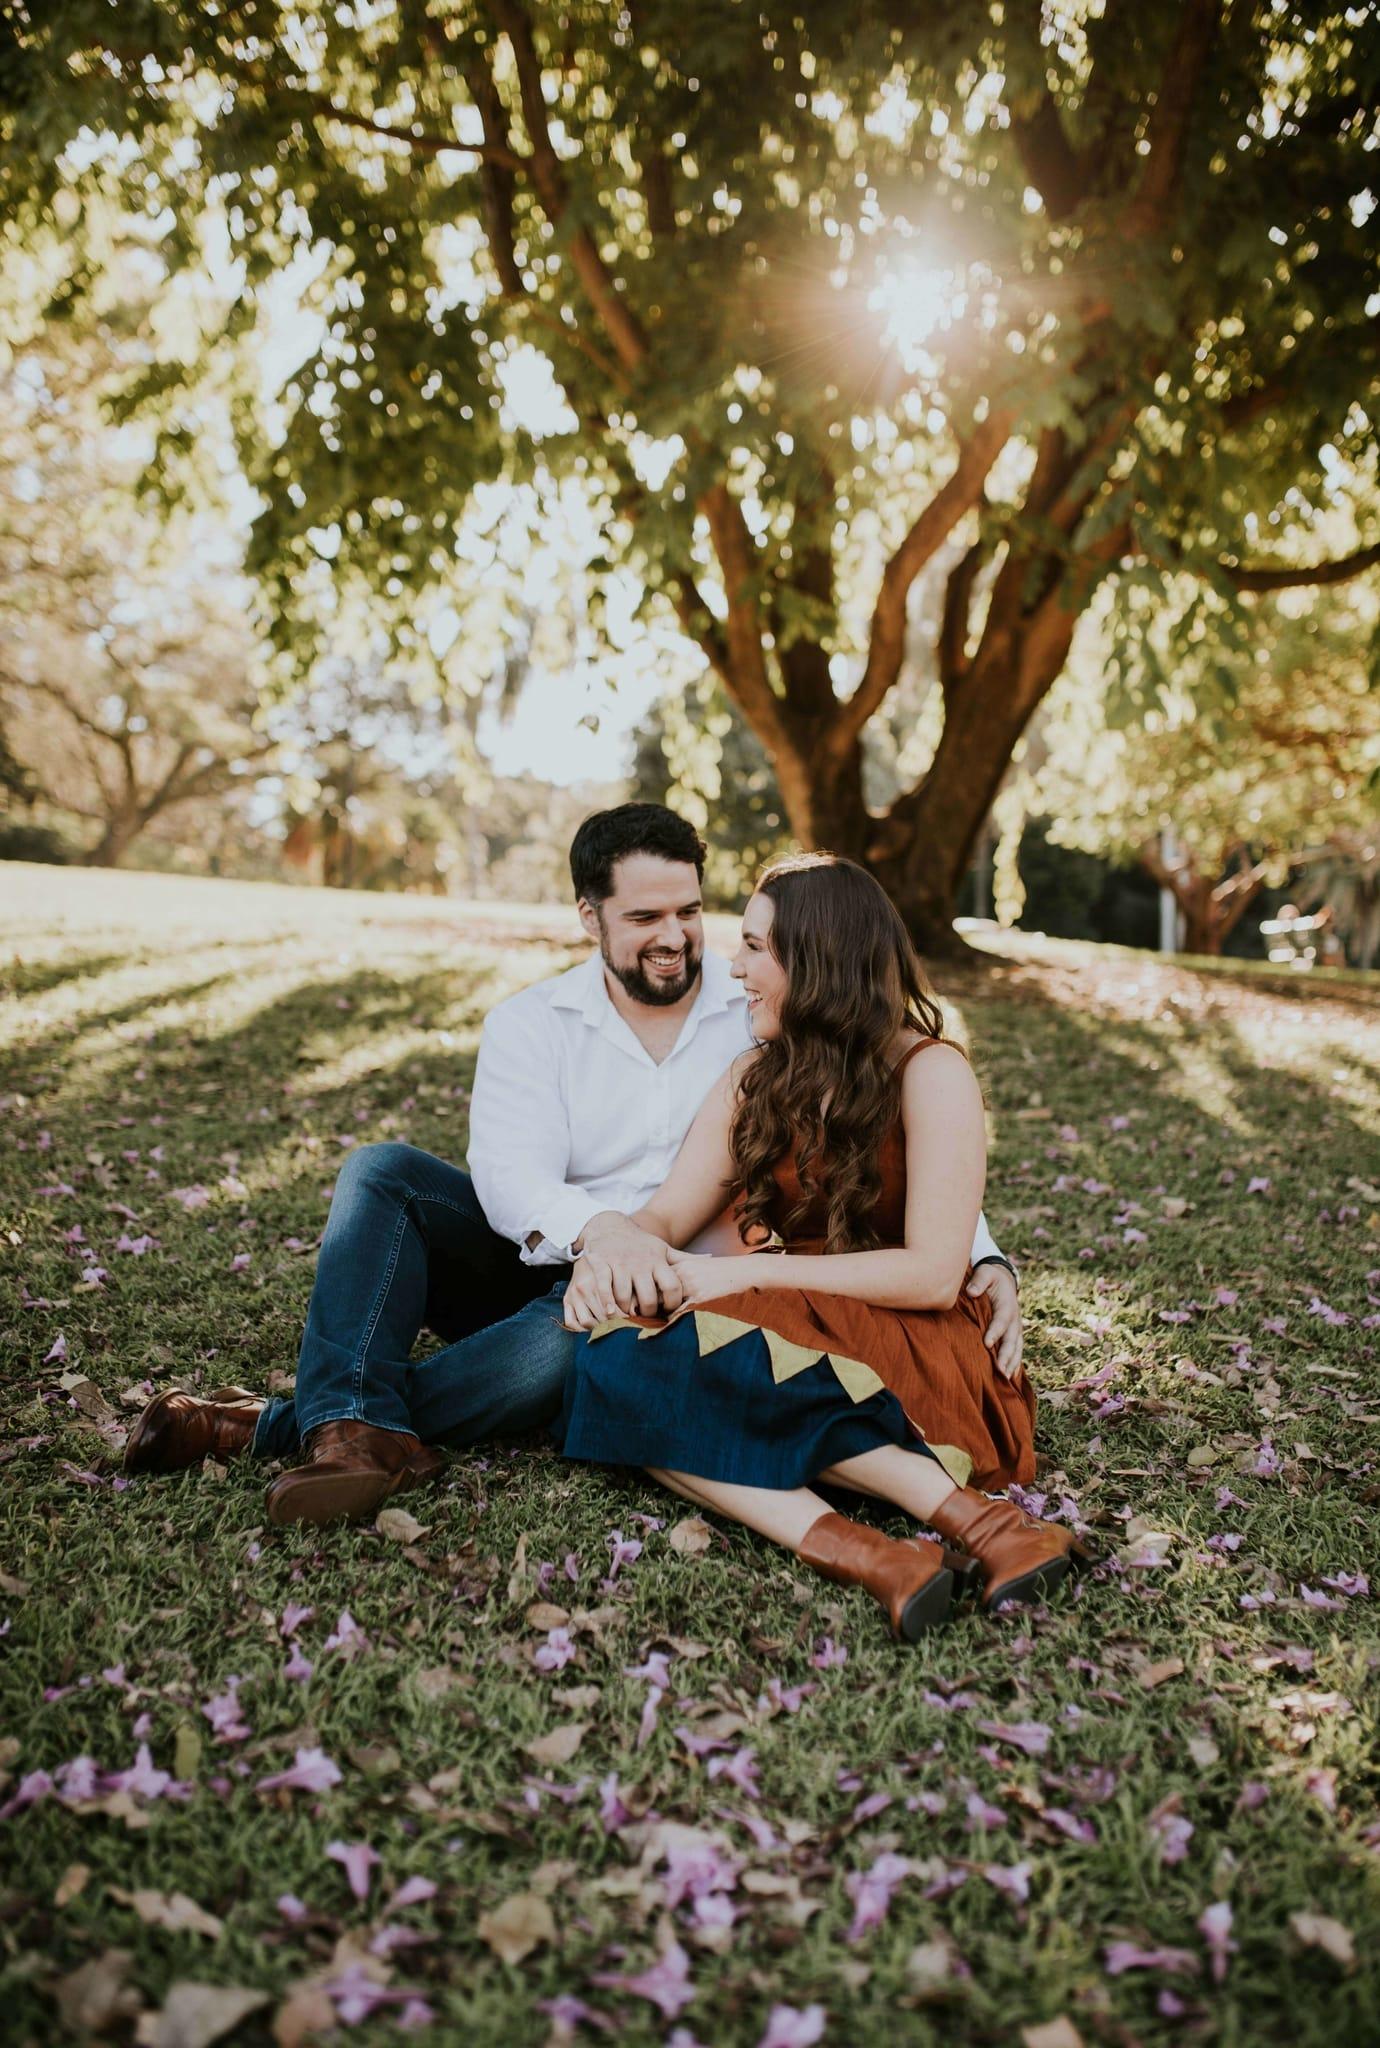 Brisbane-Engagement-Photographer-Natalie-Skoric-7.jpg